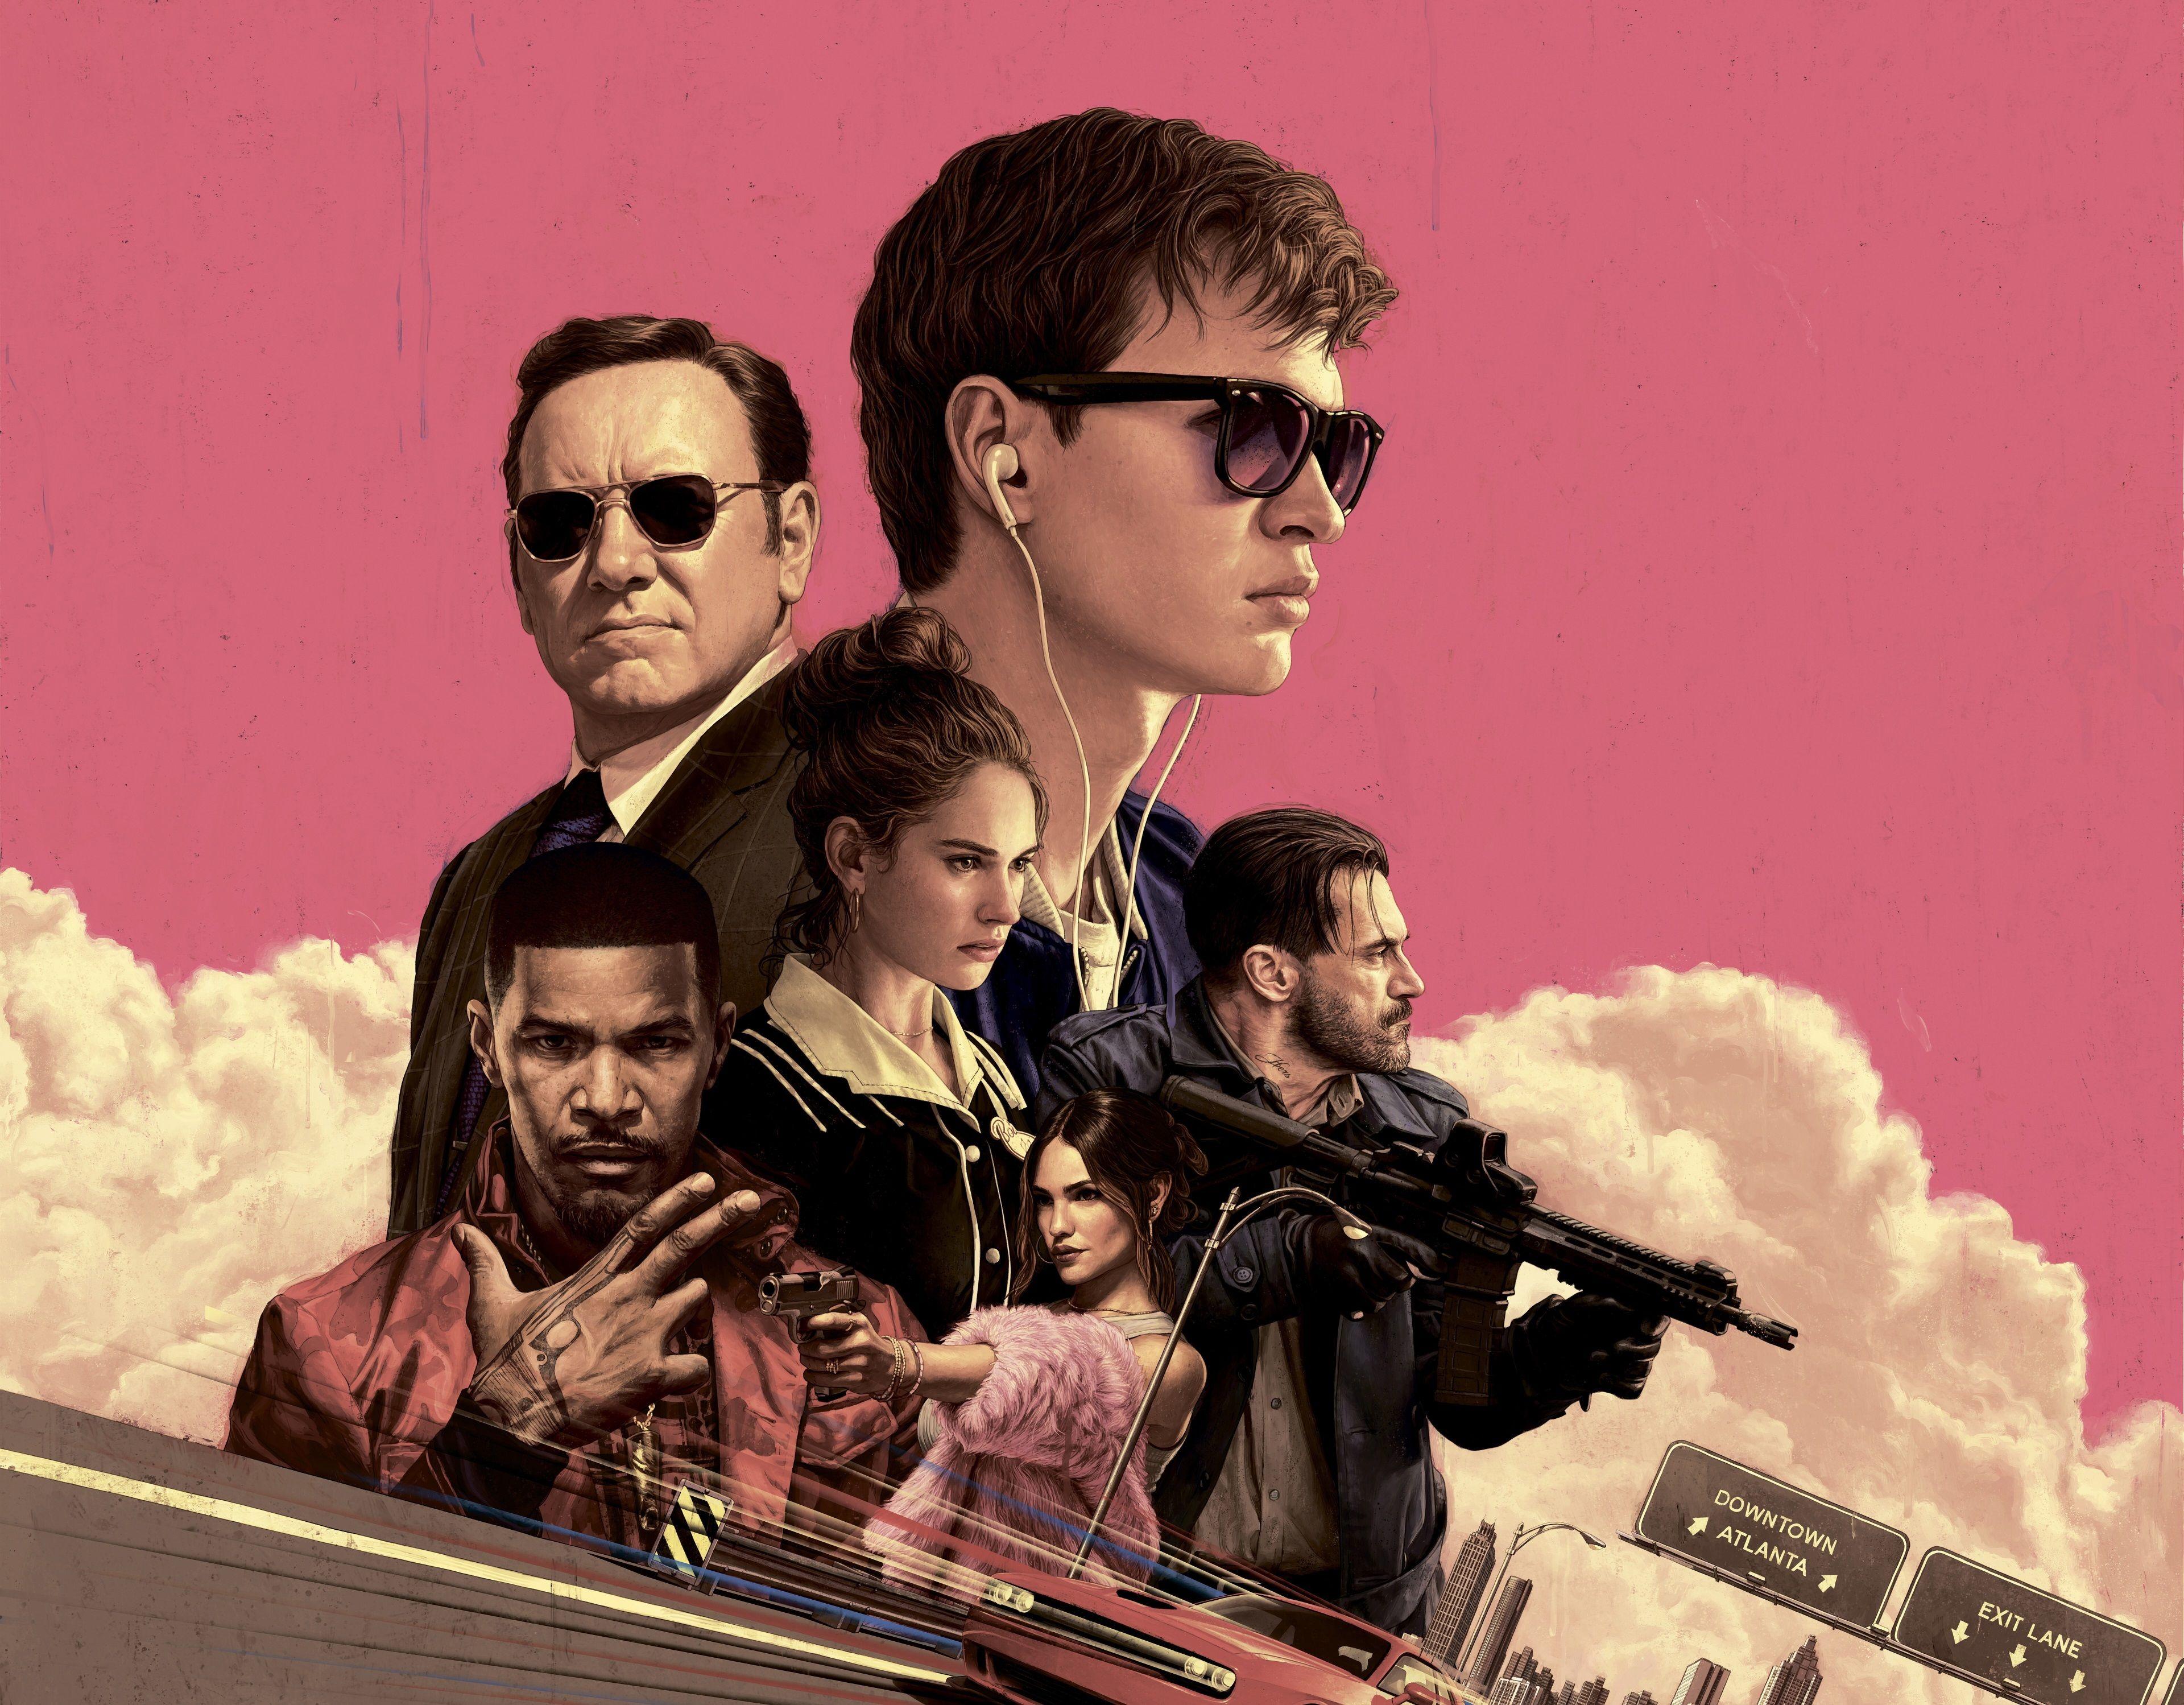 3840x2997 Baby Driver 4k Free Wallpaper Desktop Background Baby Driver Baby Driver Poster Baby Driver Full Movie